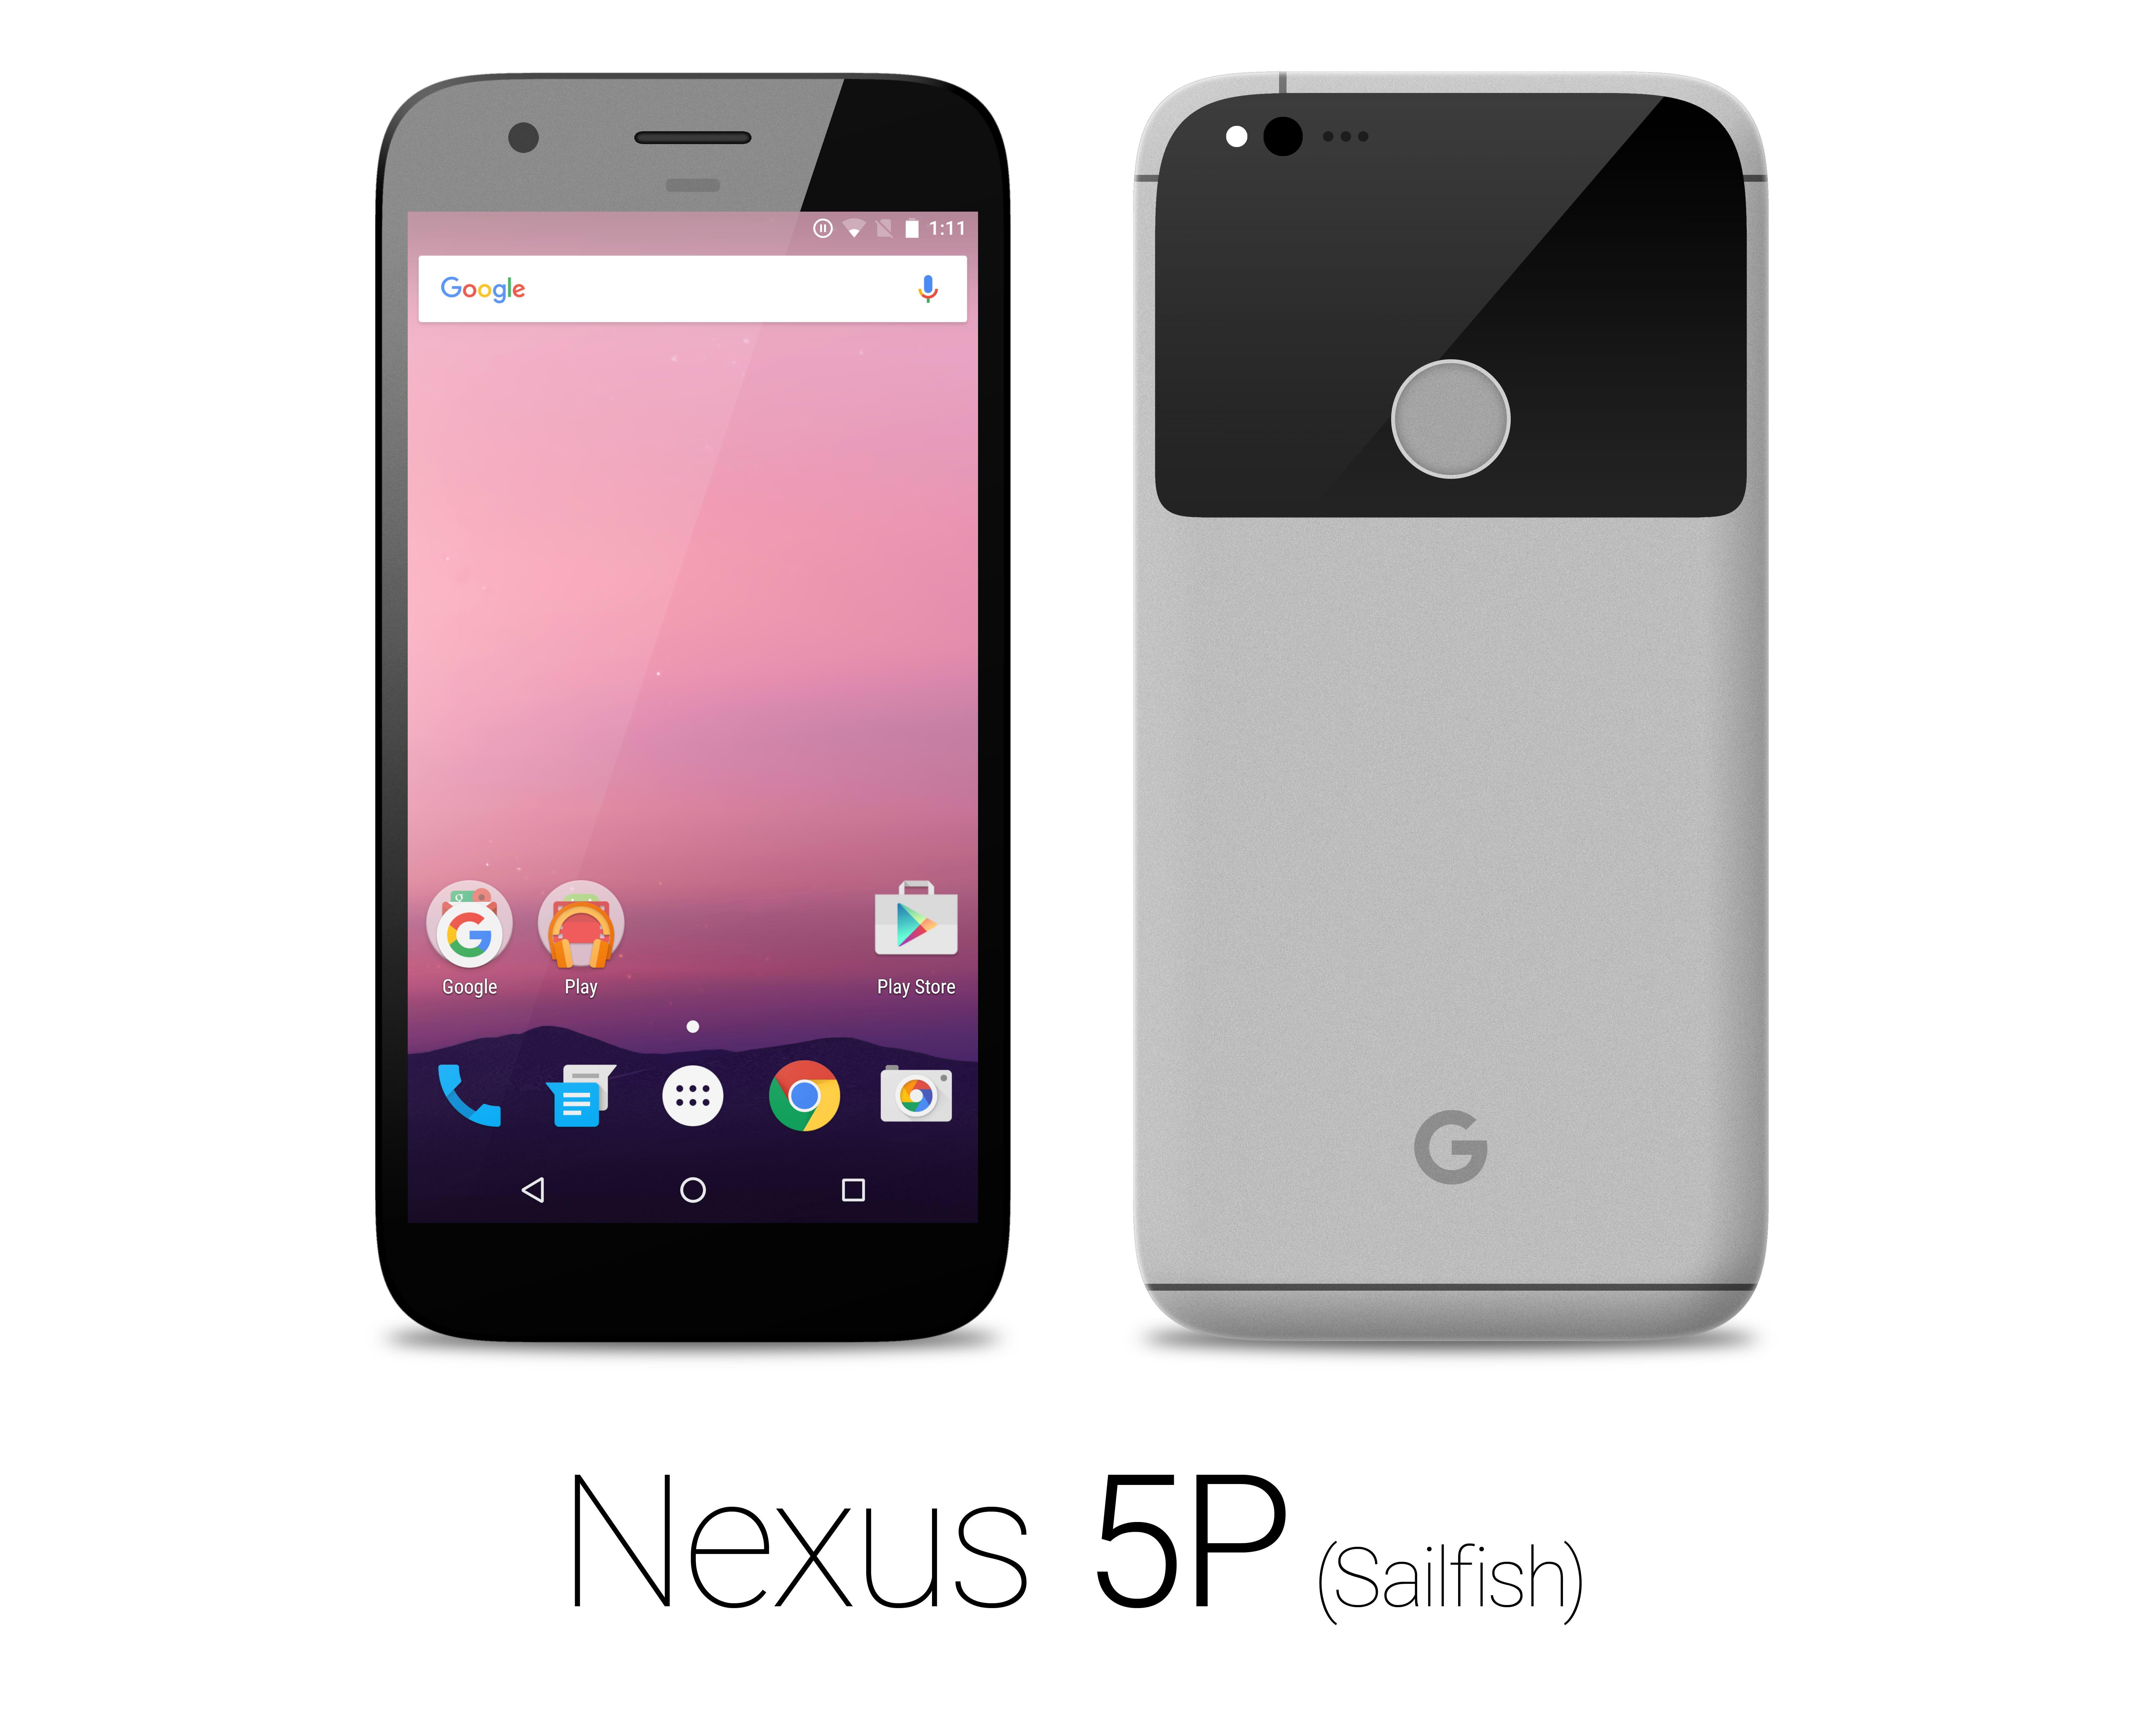 HTC Nexus 5P